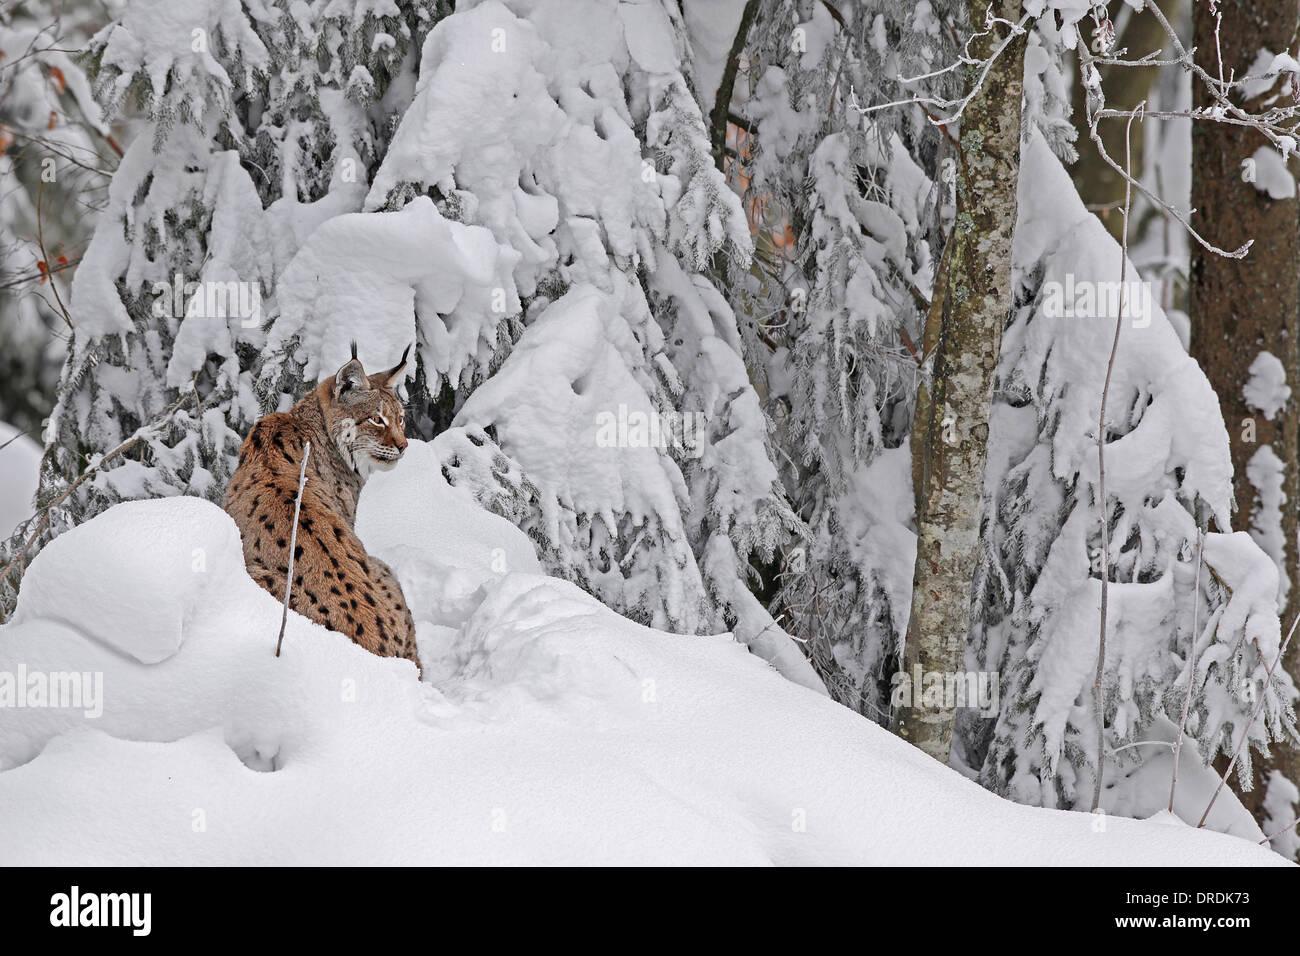 Eurasian Lynx in a snowy forest Stock Photo